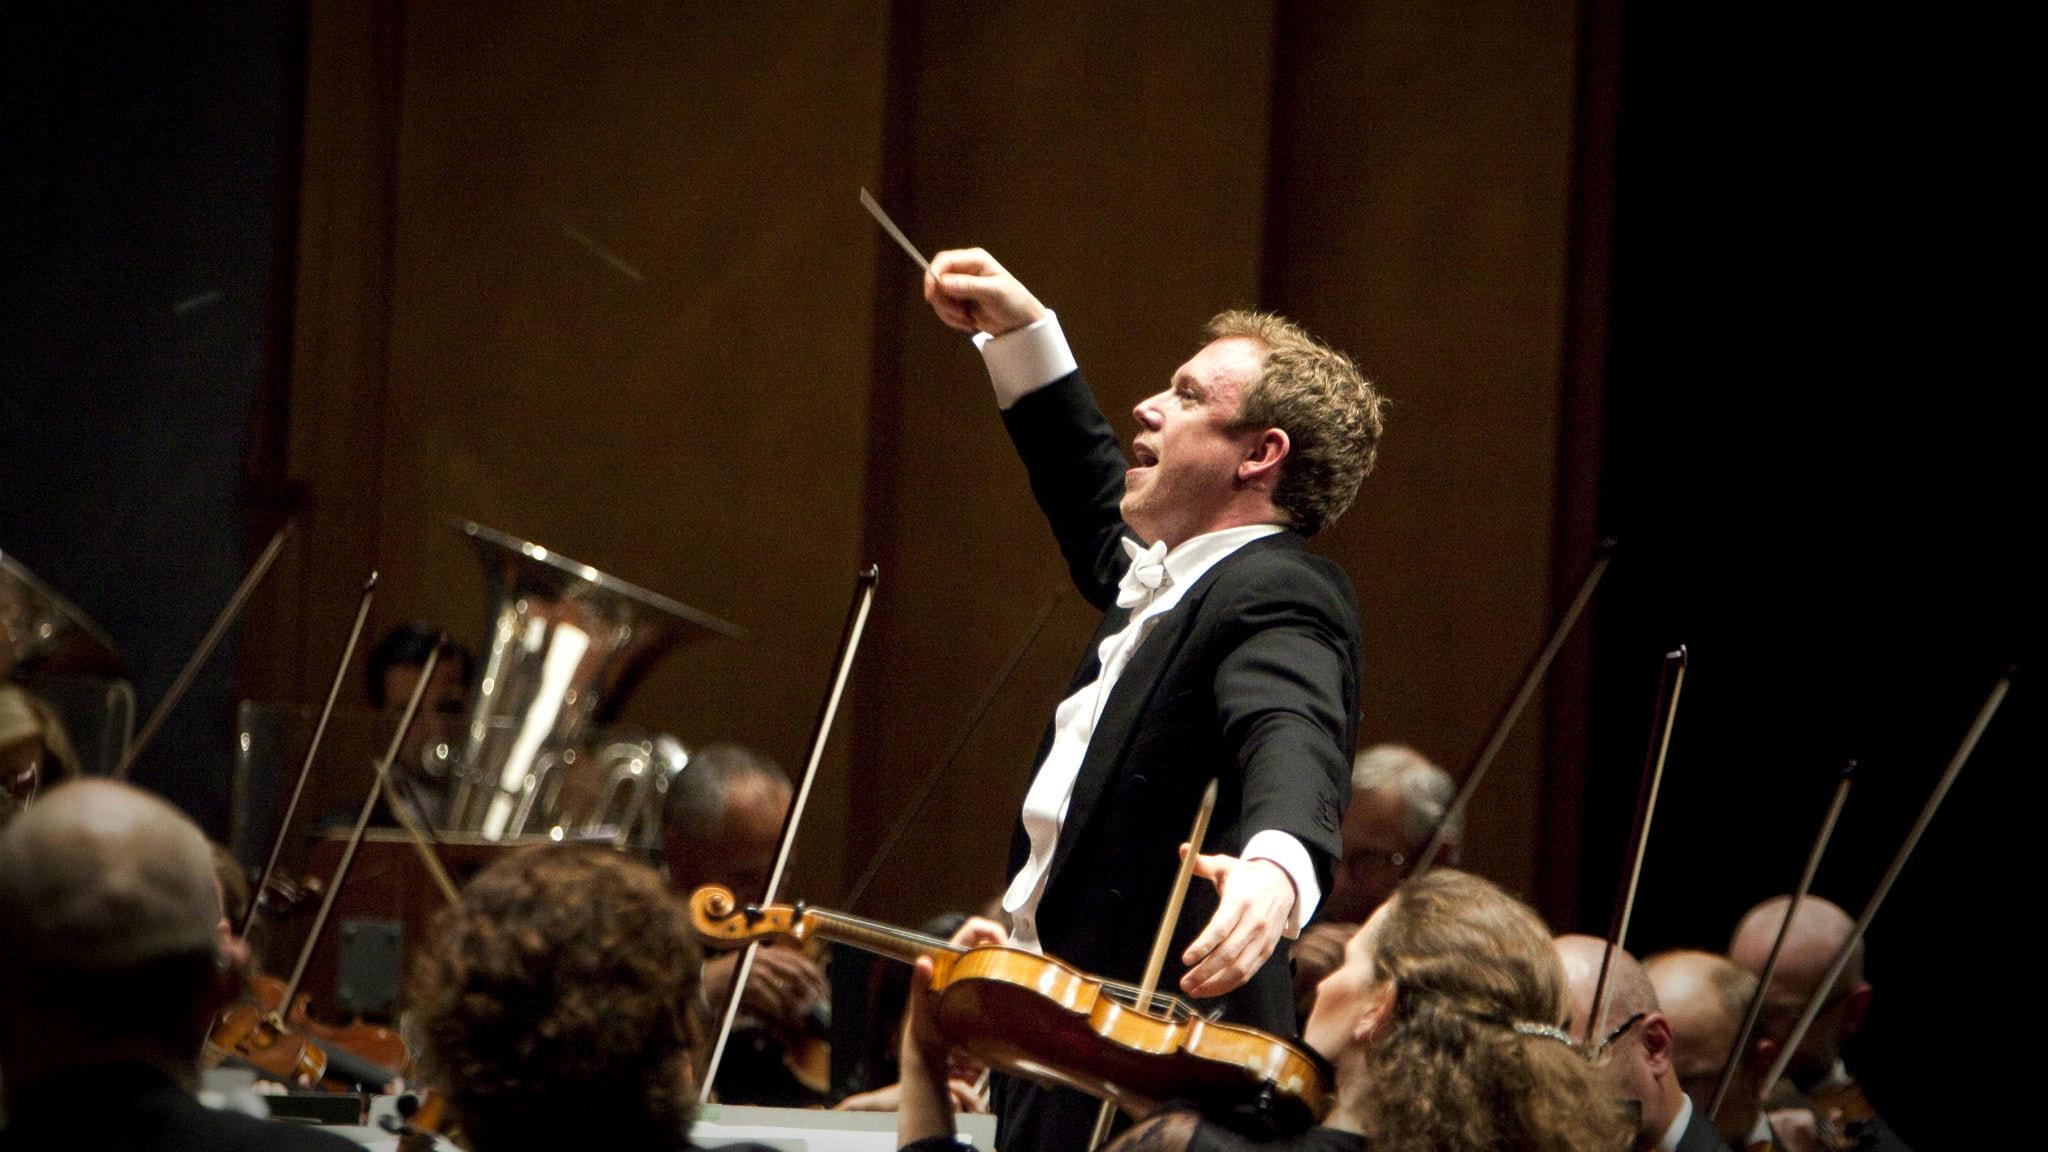 Radiosymfonikerna spelar Mahlers Symfoni nr 1